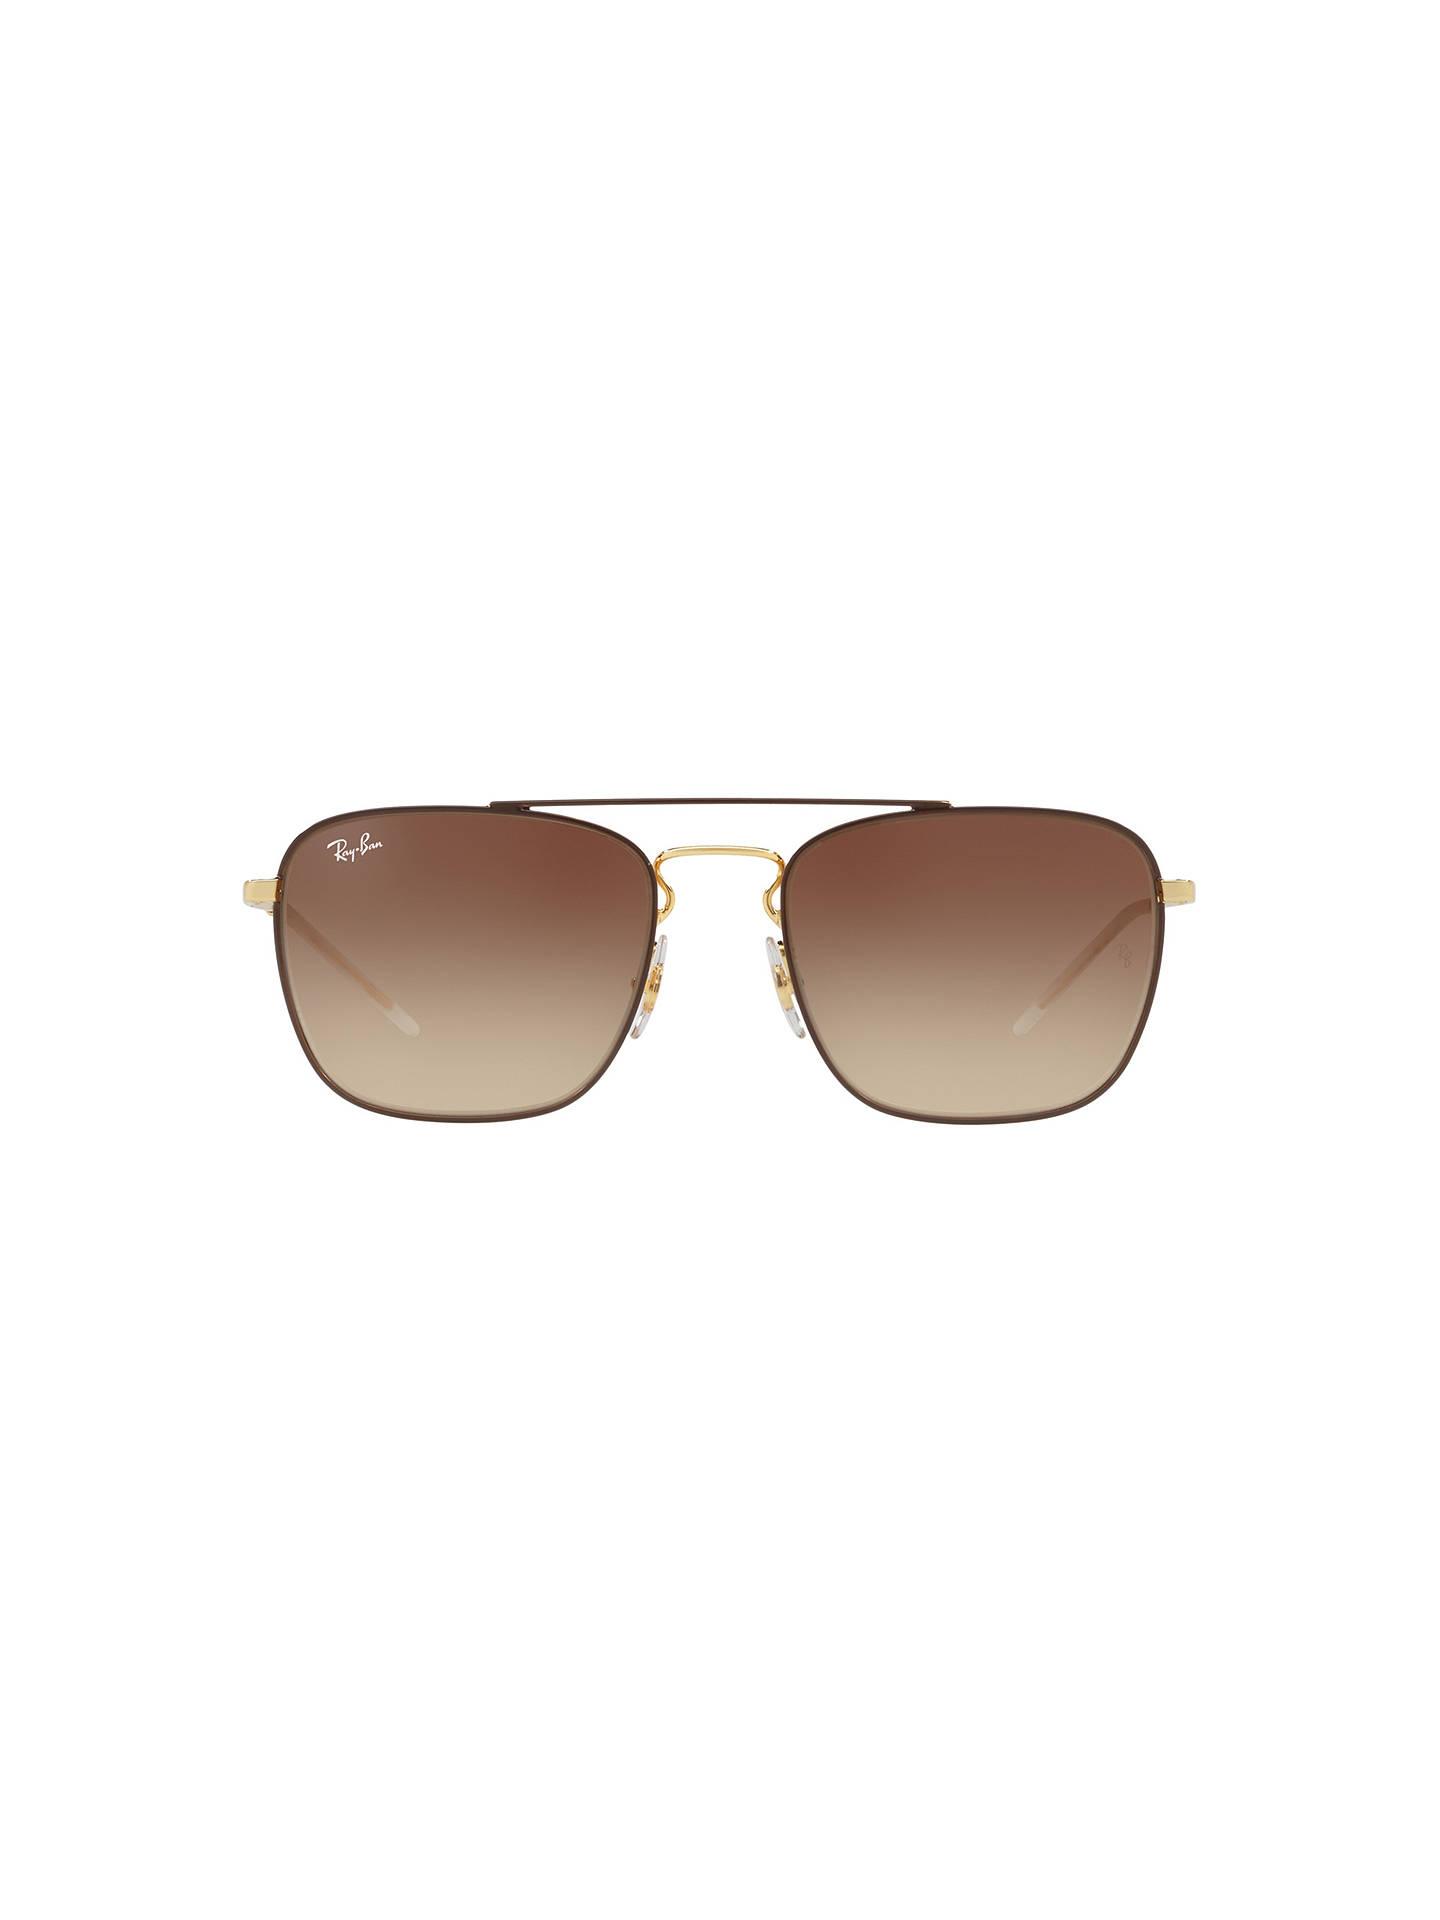 d7ac54ae7c9 Ray-Ban RB3588 Men s Square Sunglasses at John Lewis   Partners